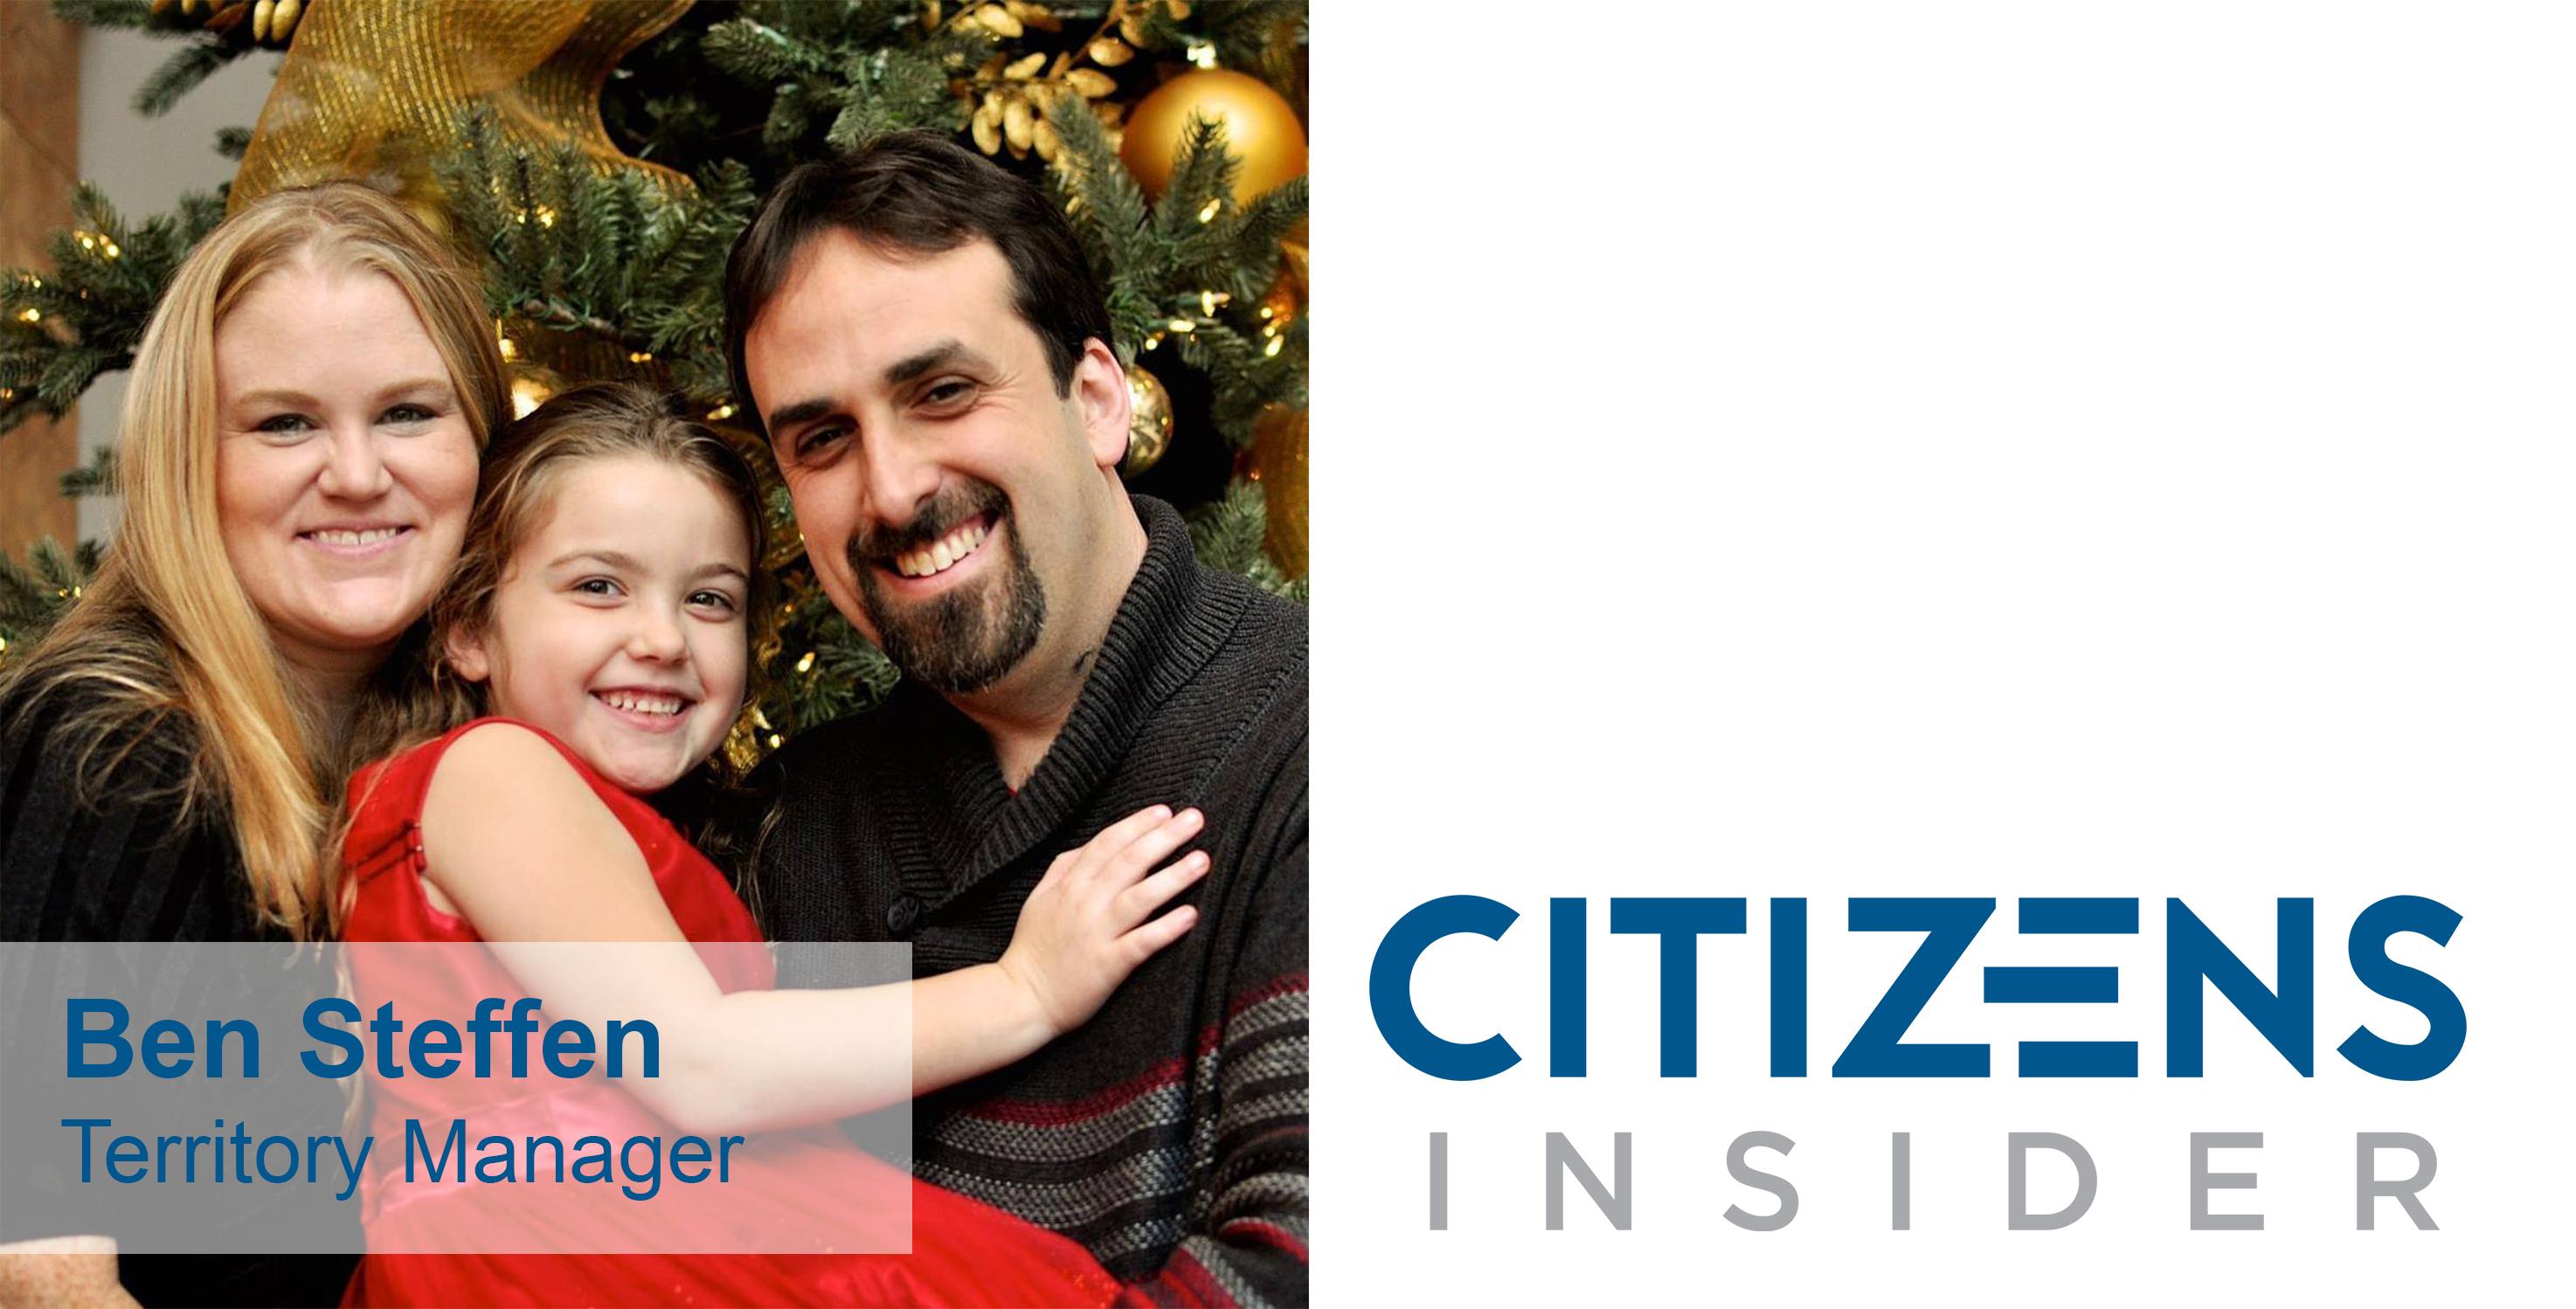 Citizens Insider: Ben Steffen